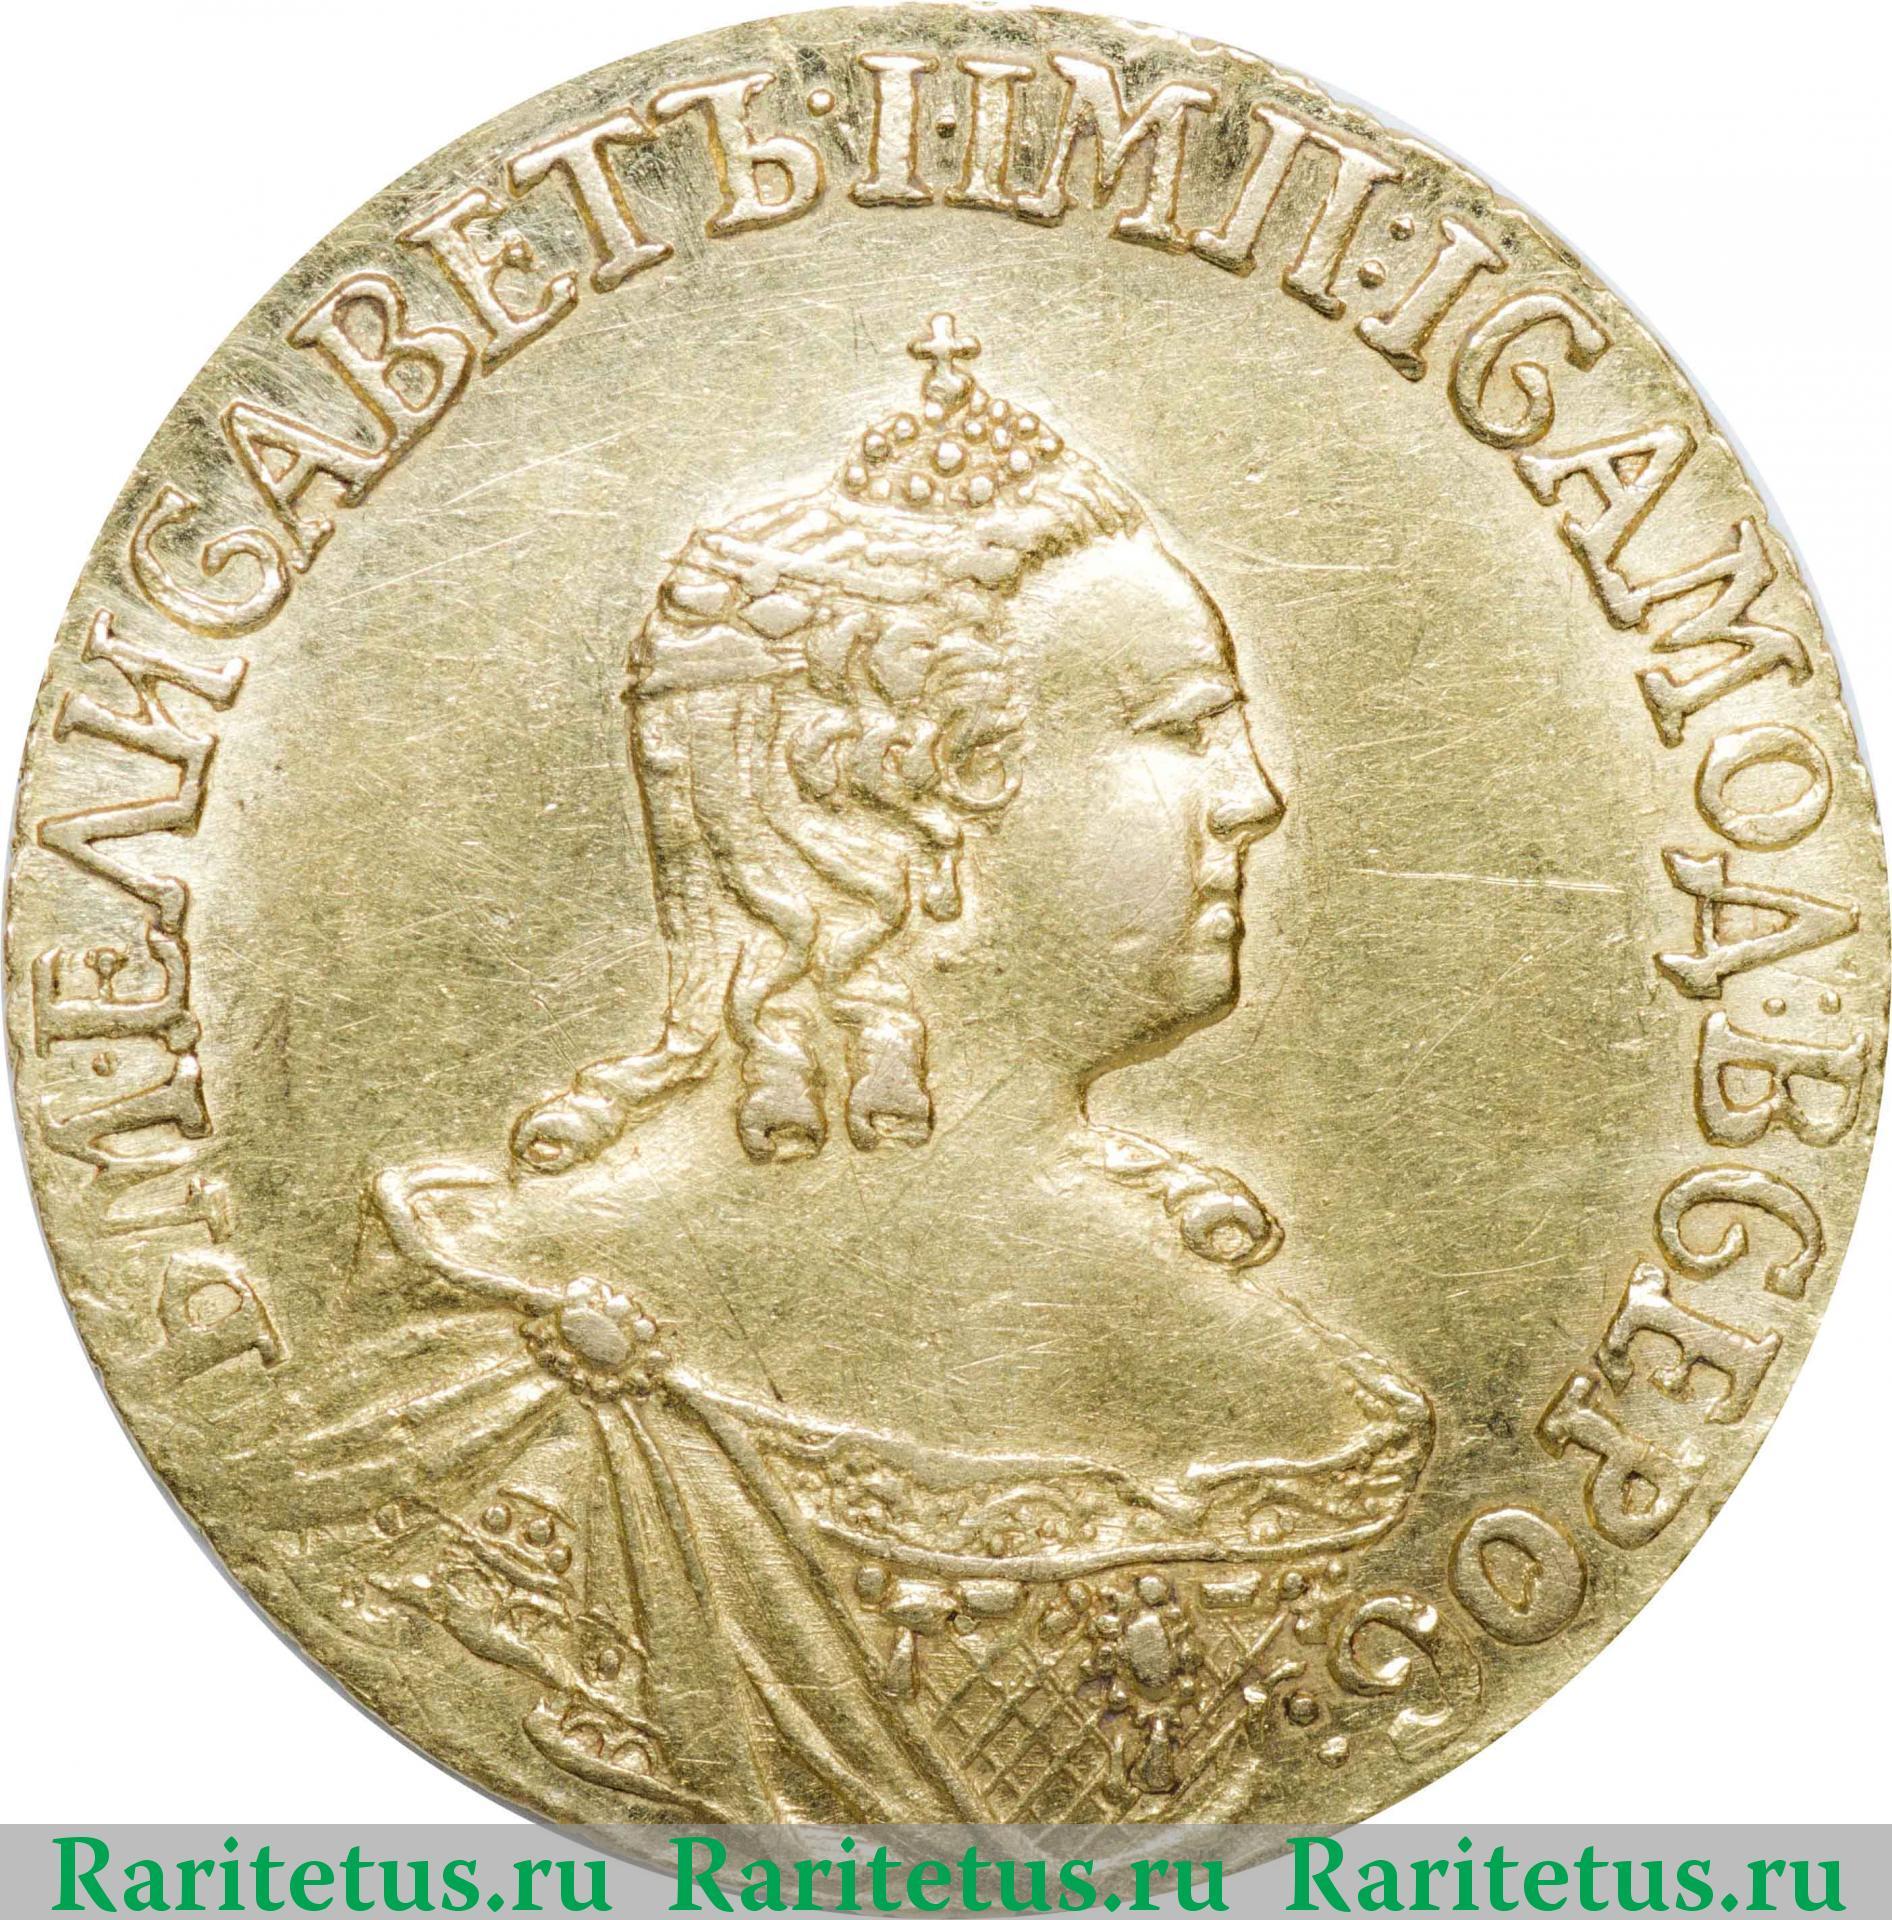 Аверс монеты 1 рубль 1756 года